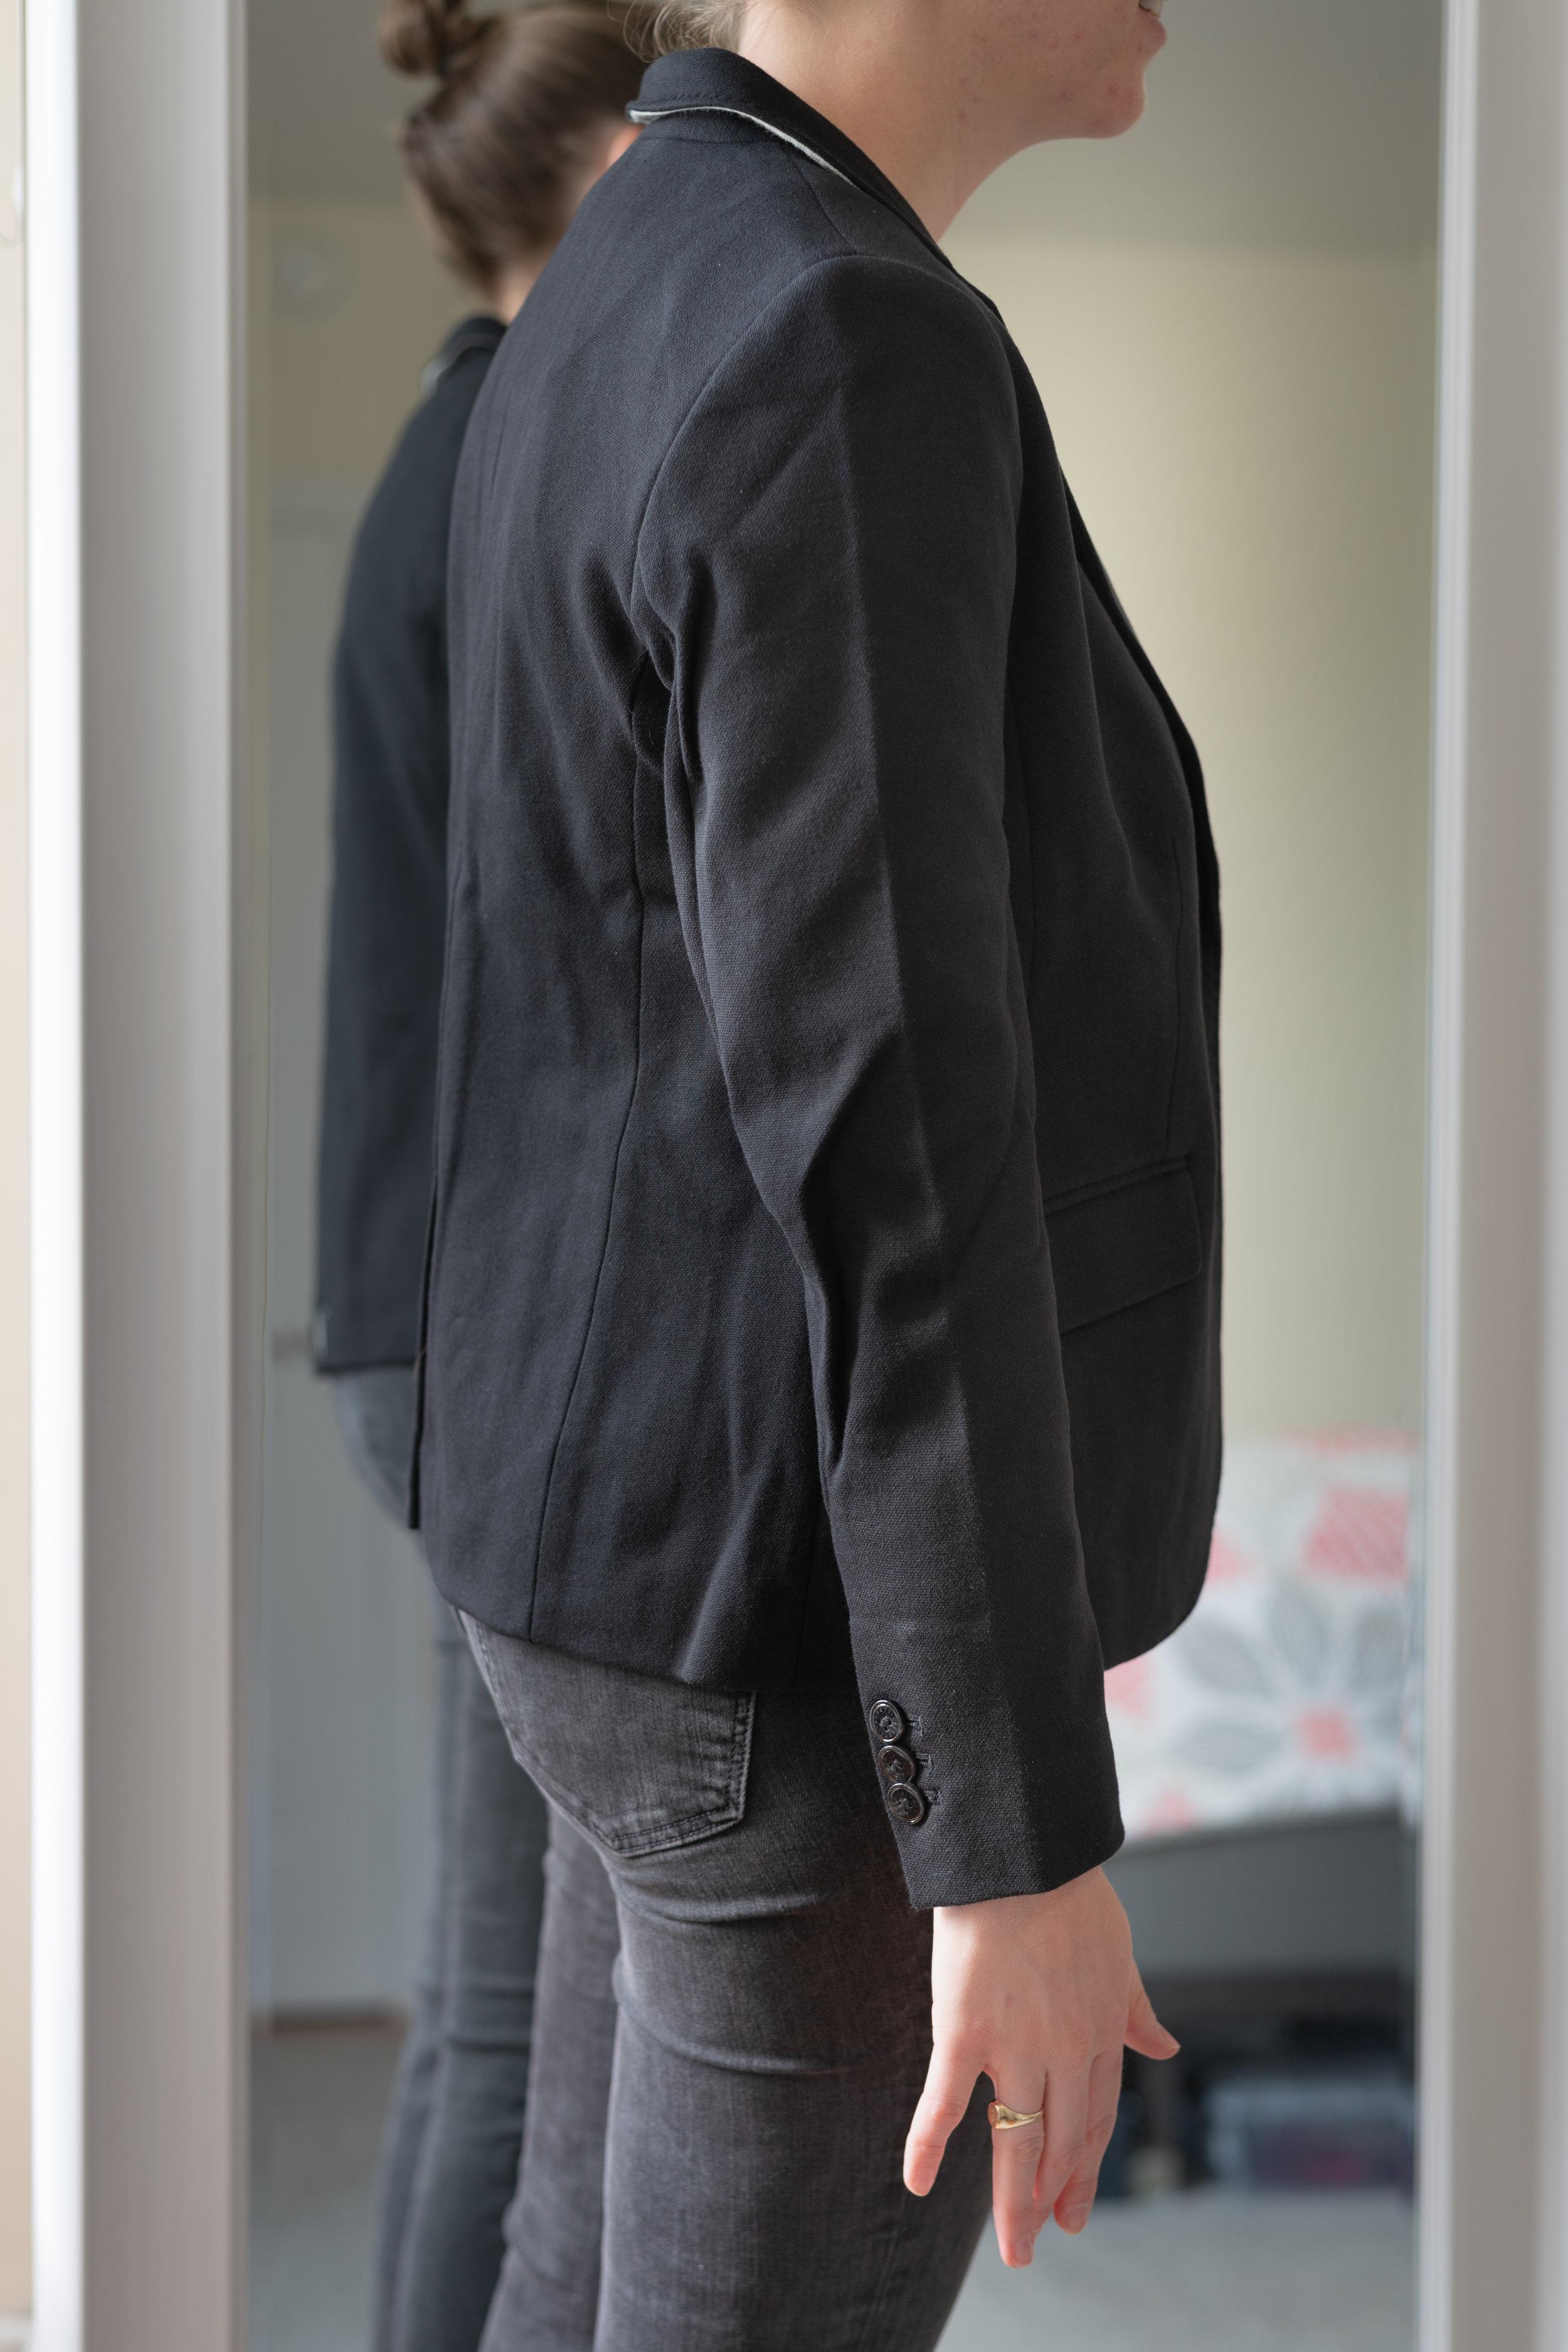 Talbots Petite Aberdeen Kint Blazer - Size 6 Petite